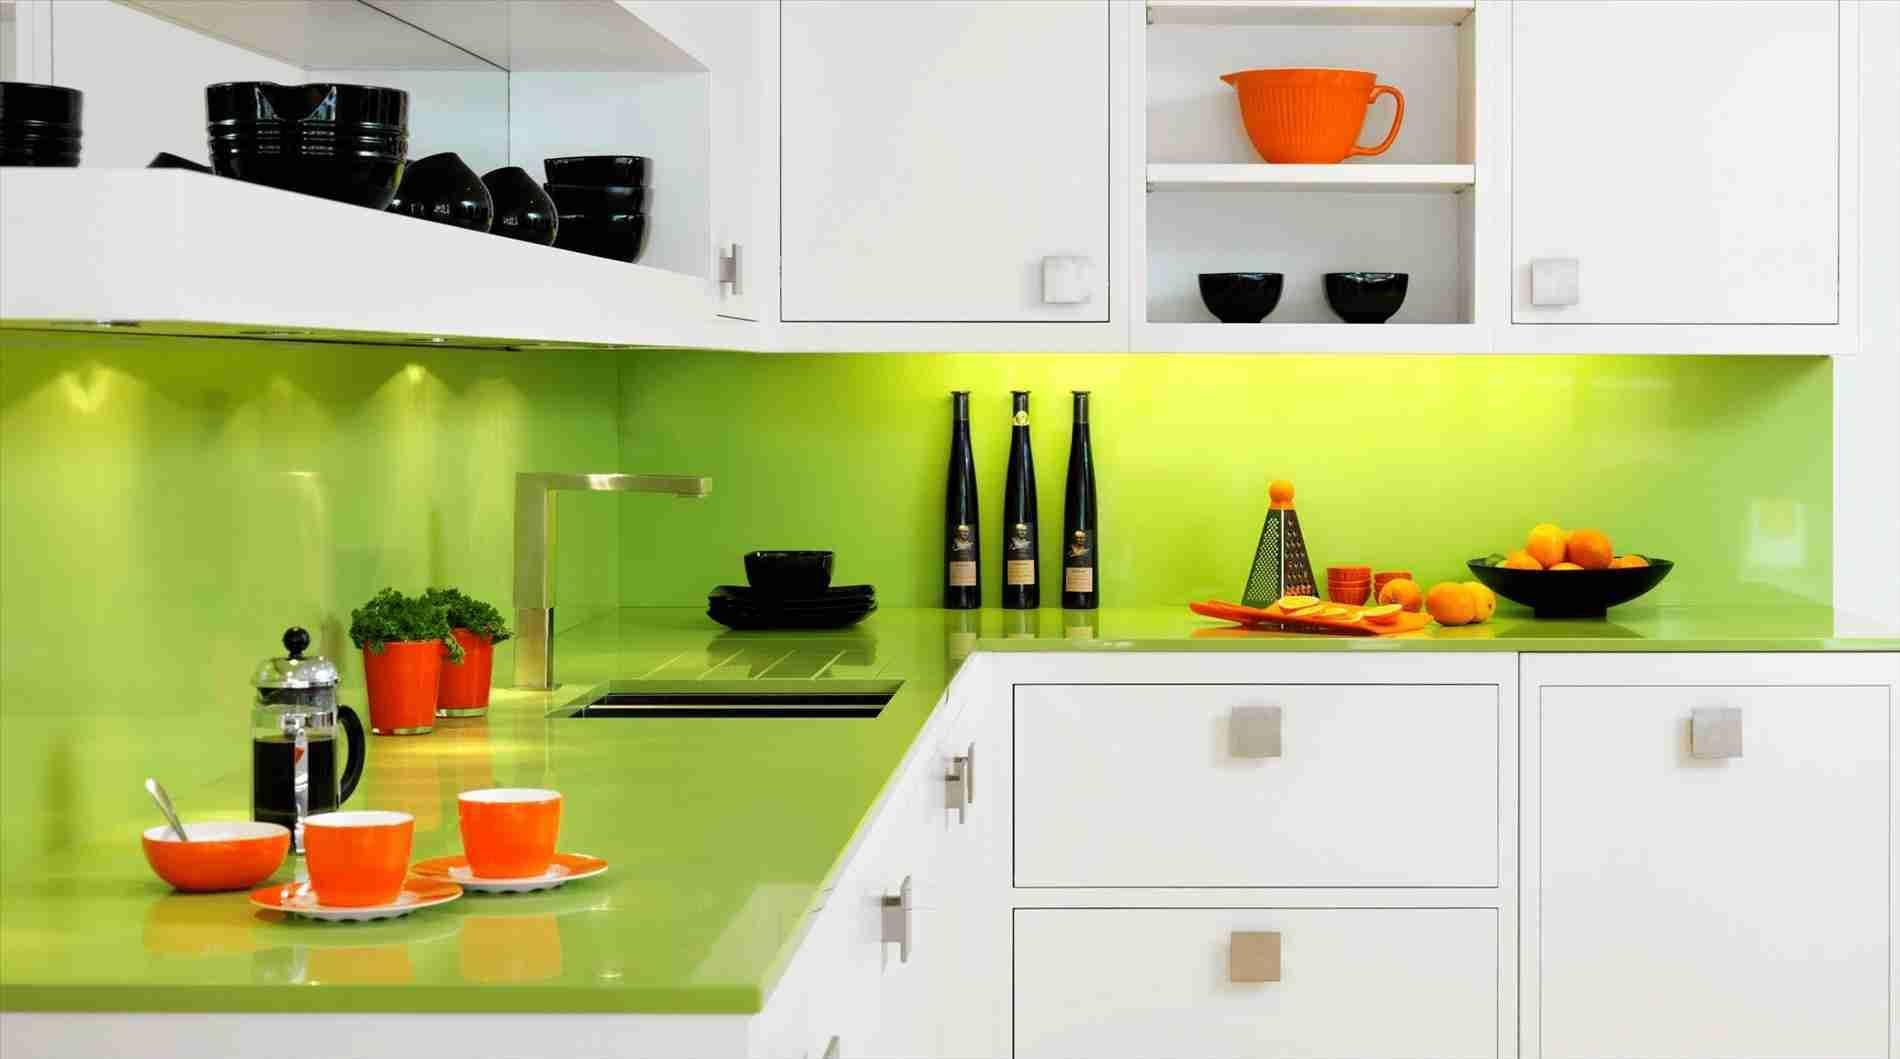 Apple Green Kitchen Cabinets Green Kitchen Decor Lovely Mjarlon My Kitchen Rules When Is It White Green Kitchen Walls Apple Green Kitchen Lime Green Kitchen